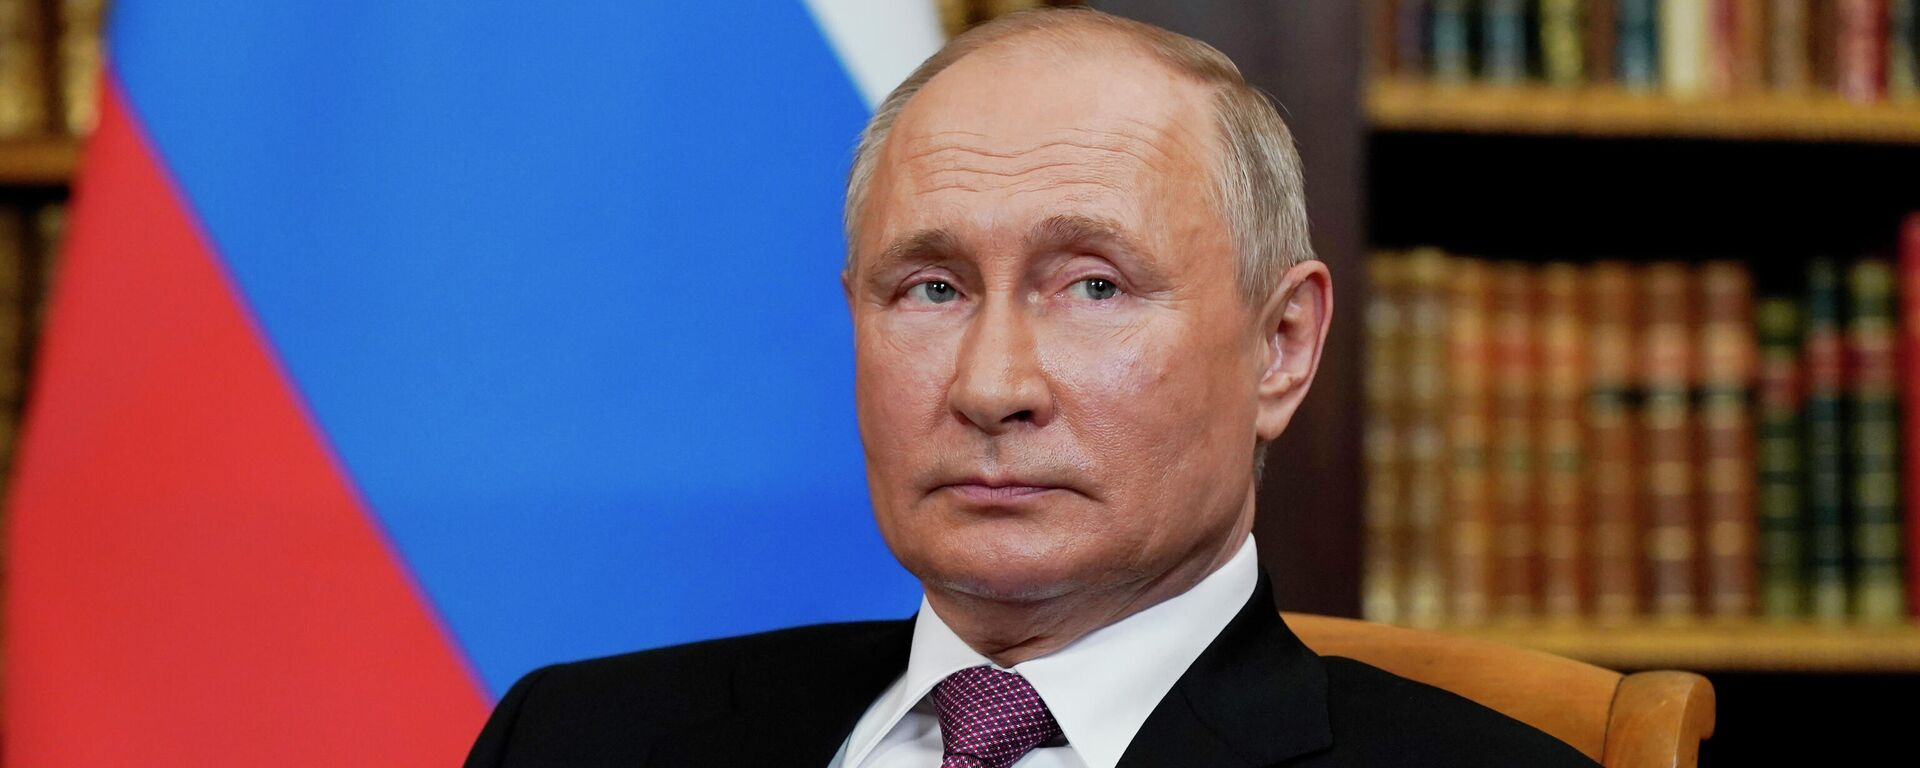 Президент России Владимир Путин - Sputnik Таджикистан, 1920, 16.06.2021